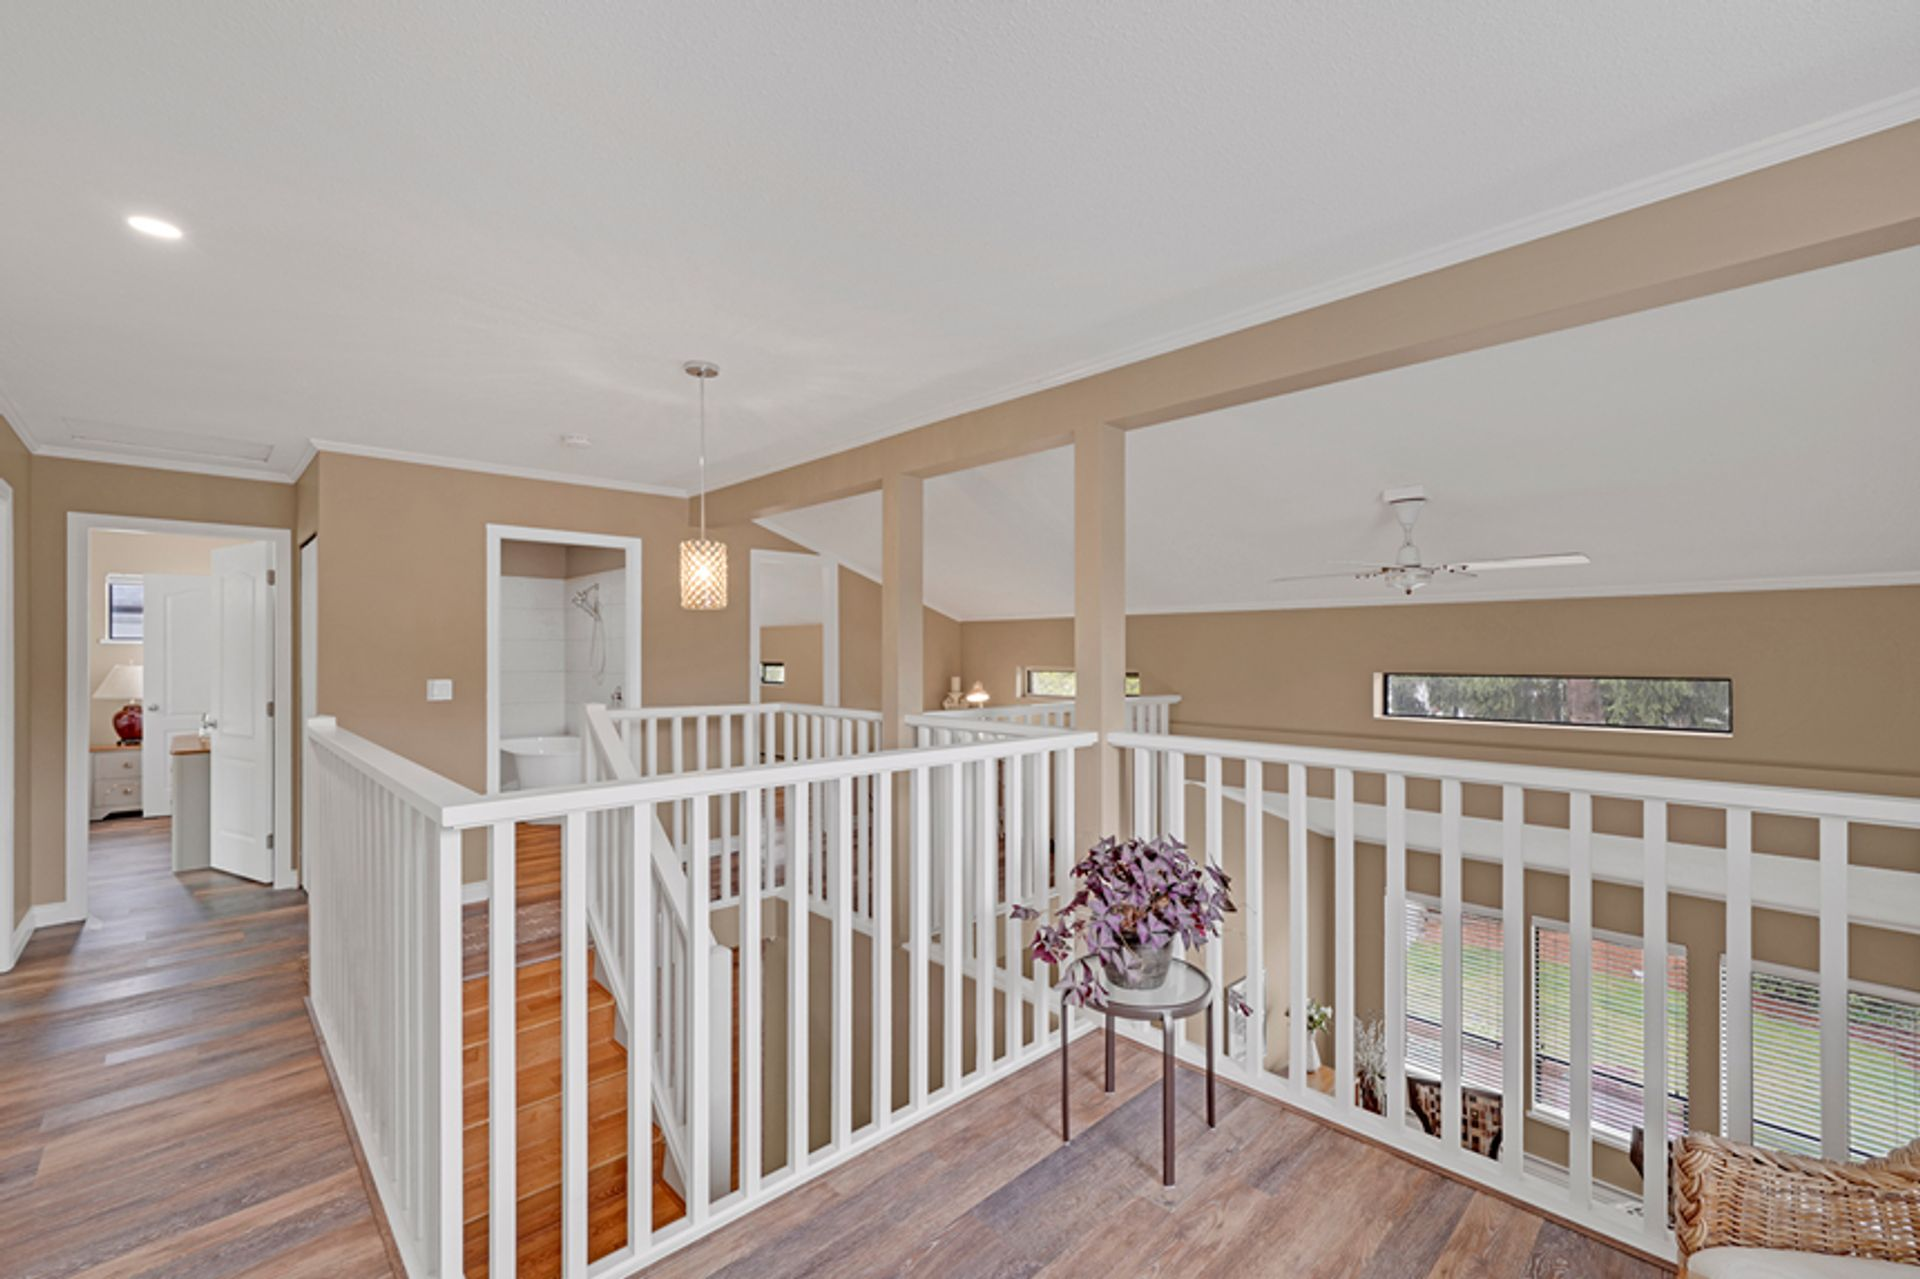 3e-above-loft-28 at 836 Irvine Street, Meadow Brook, Coquitlam